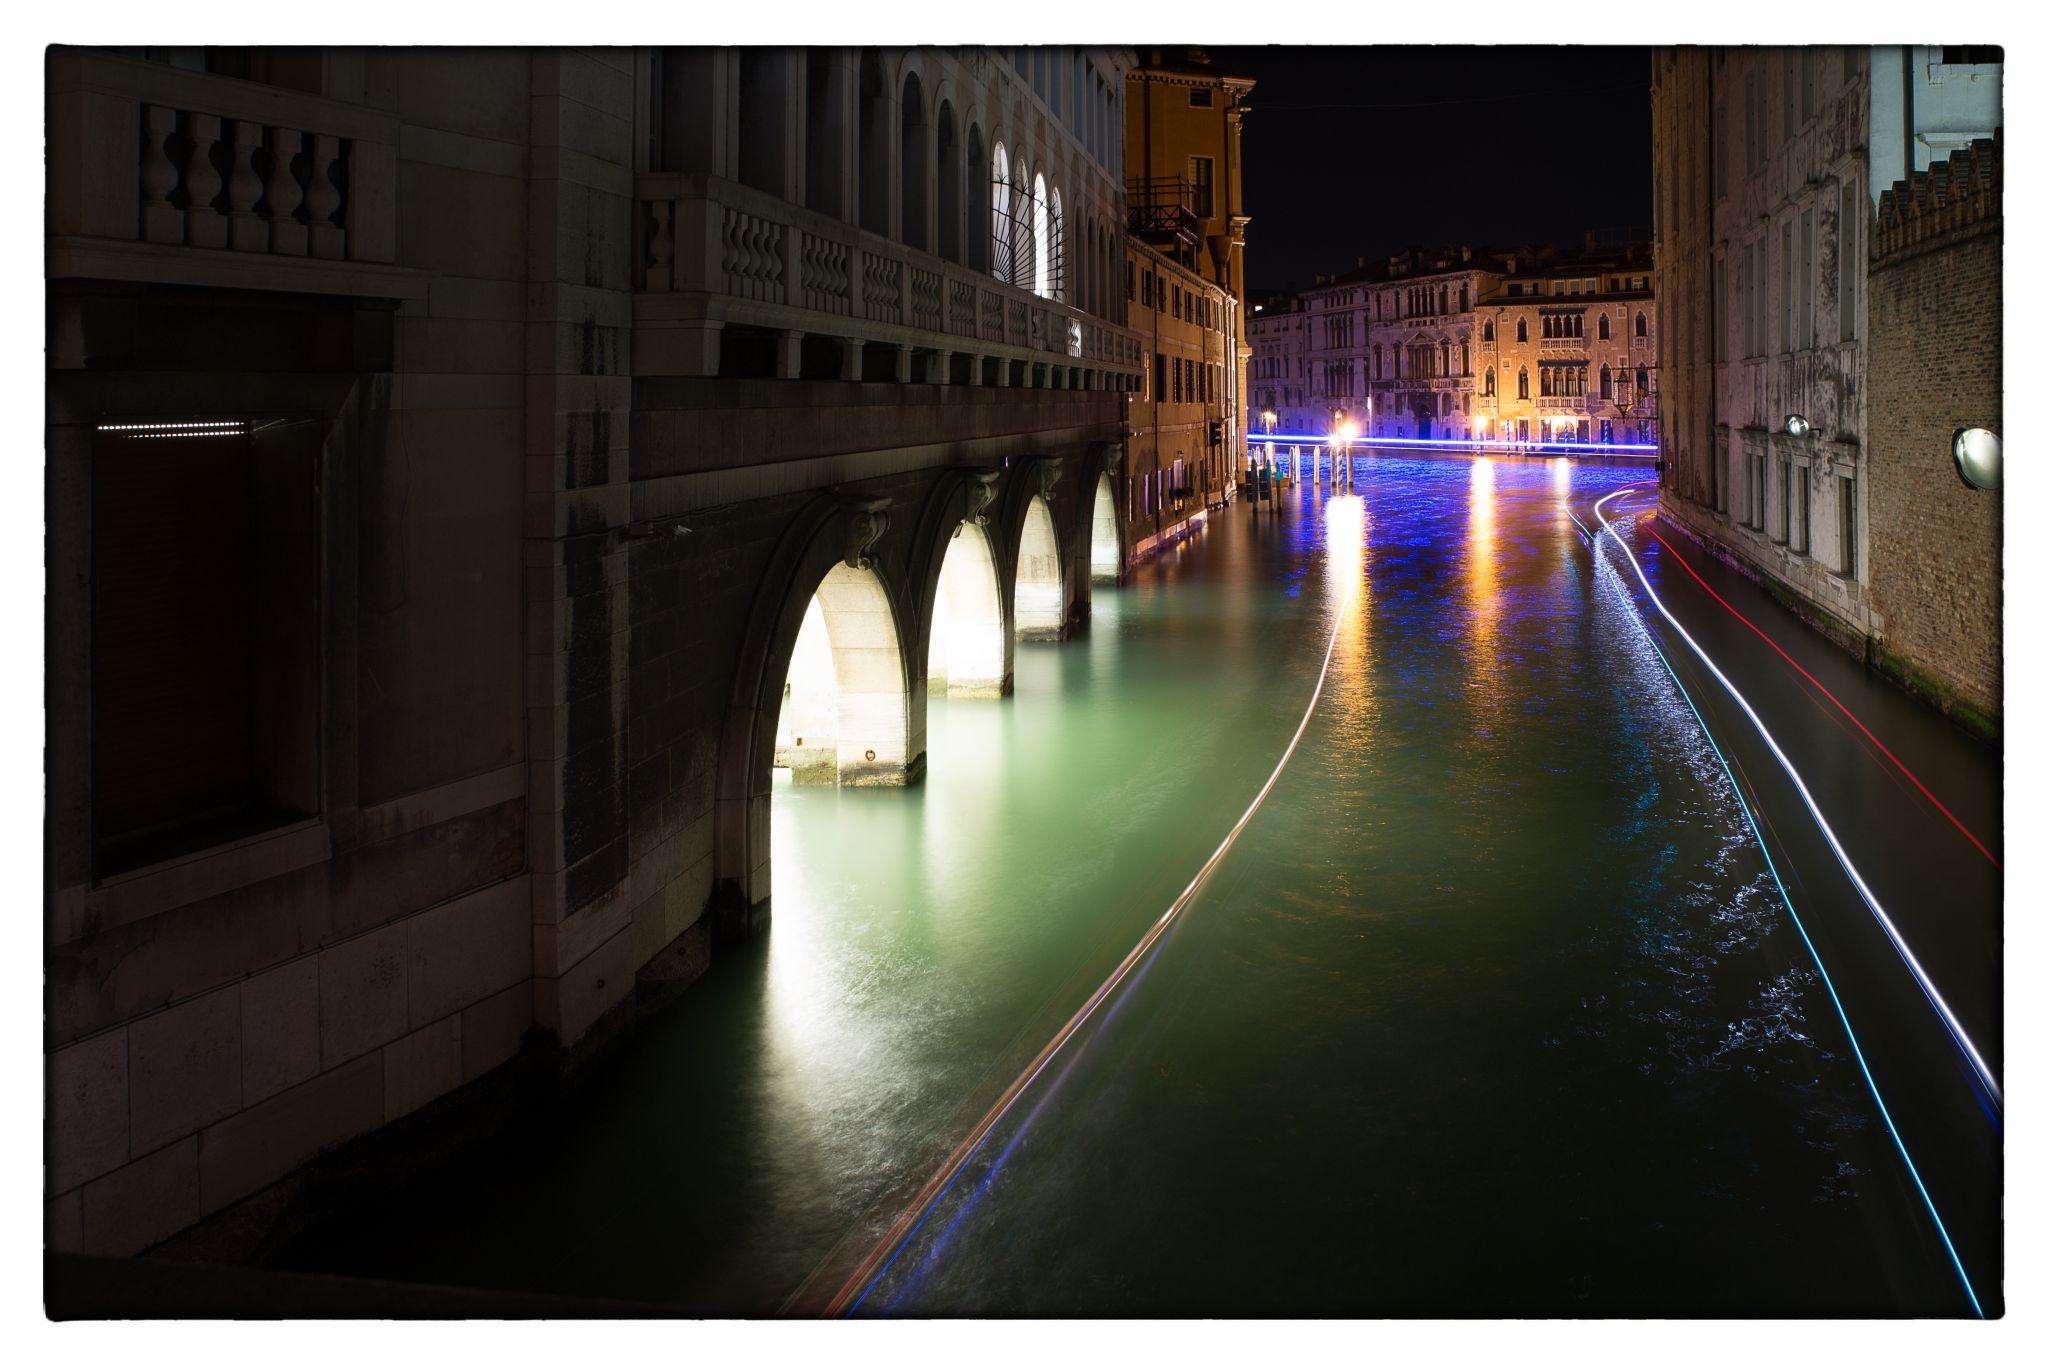 Feuerwache von Venedig, Italy